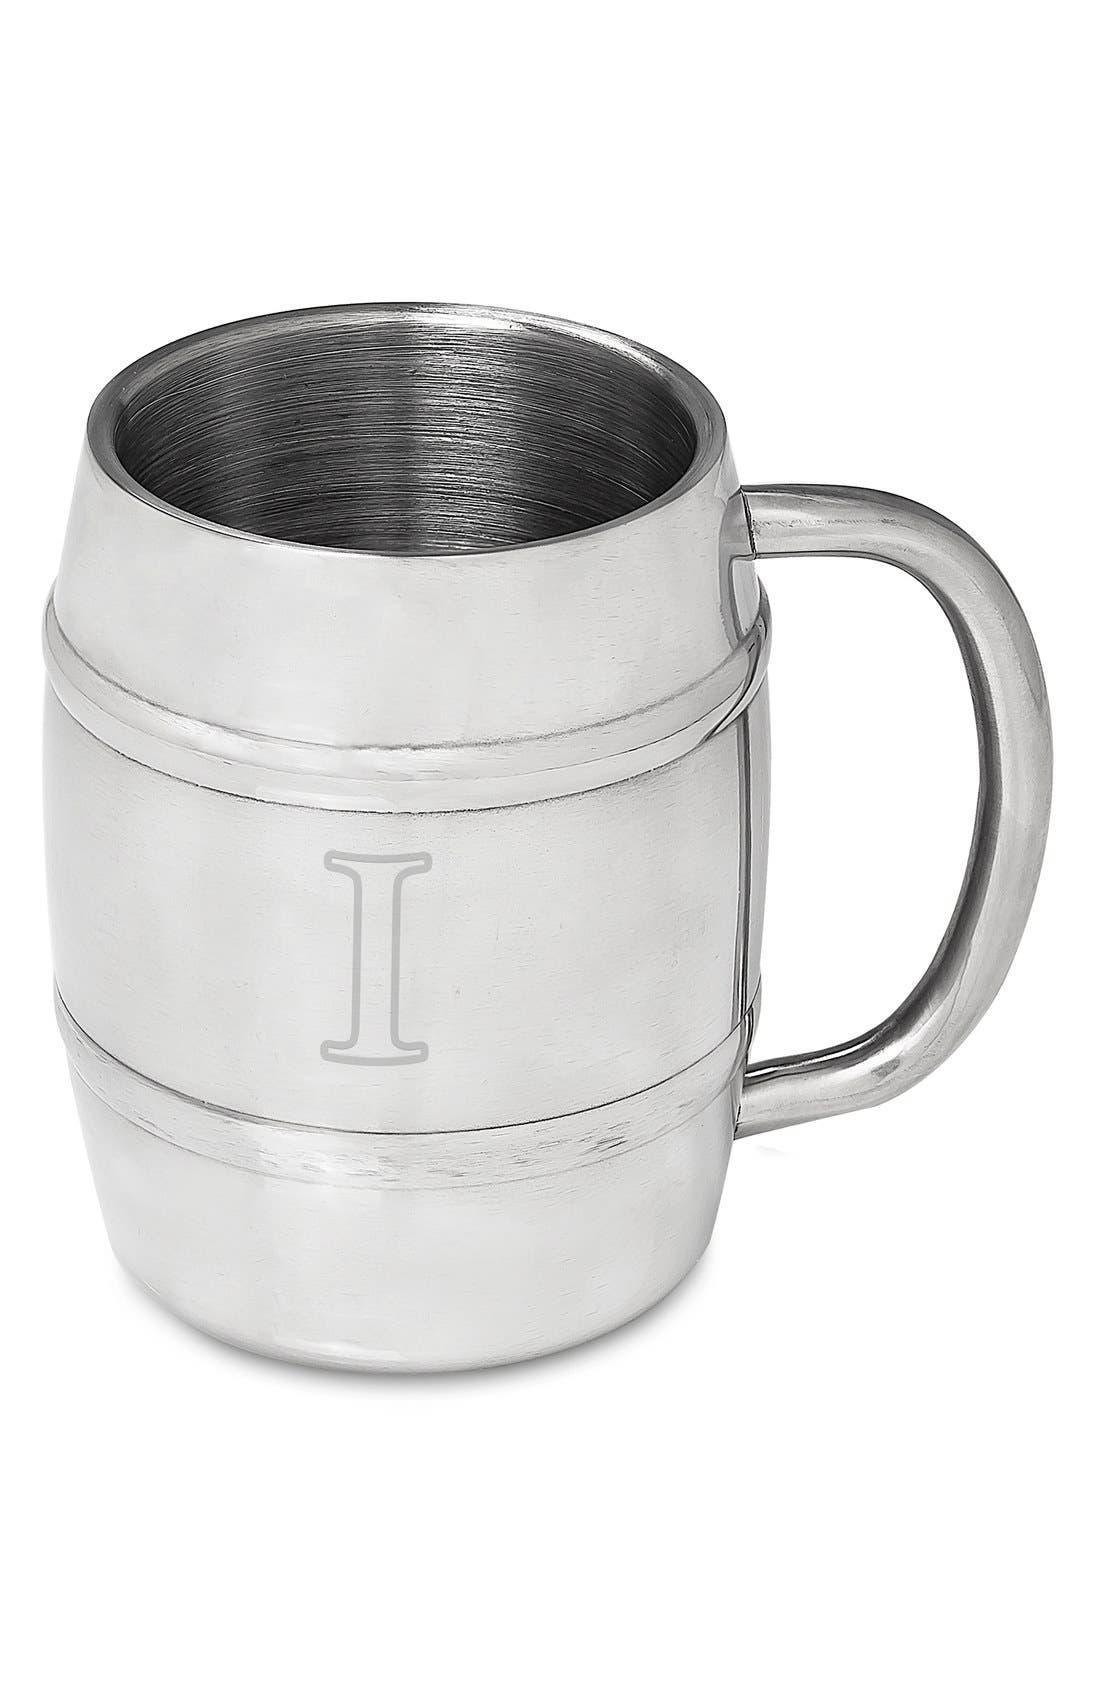 Monogram Stainless Steel Keg Mug,                             Main thumbnail 11, color,